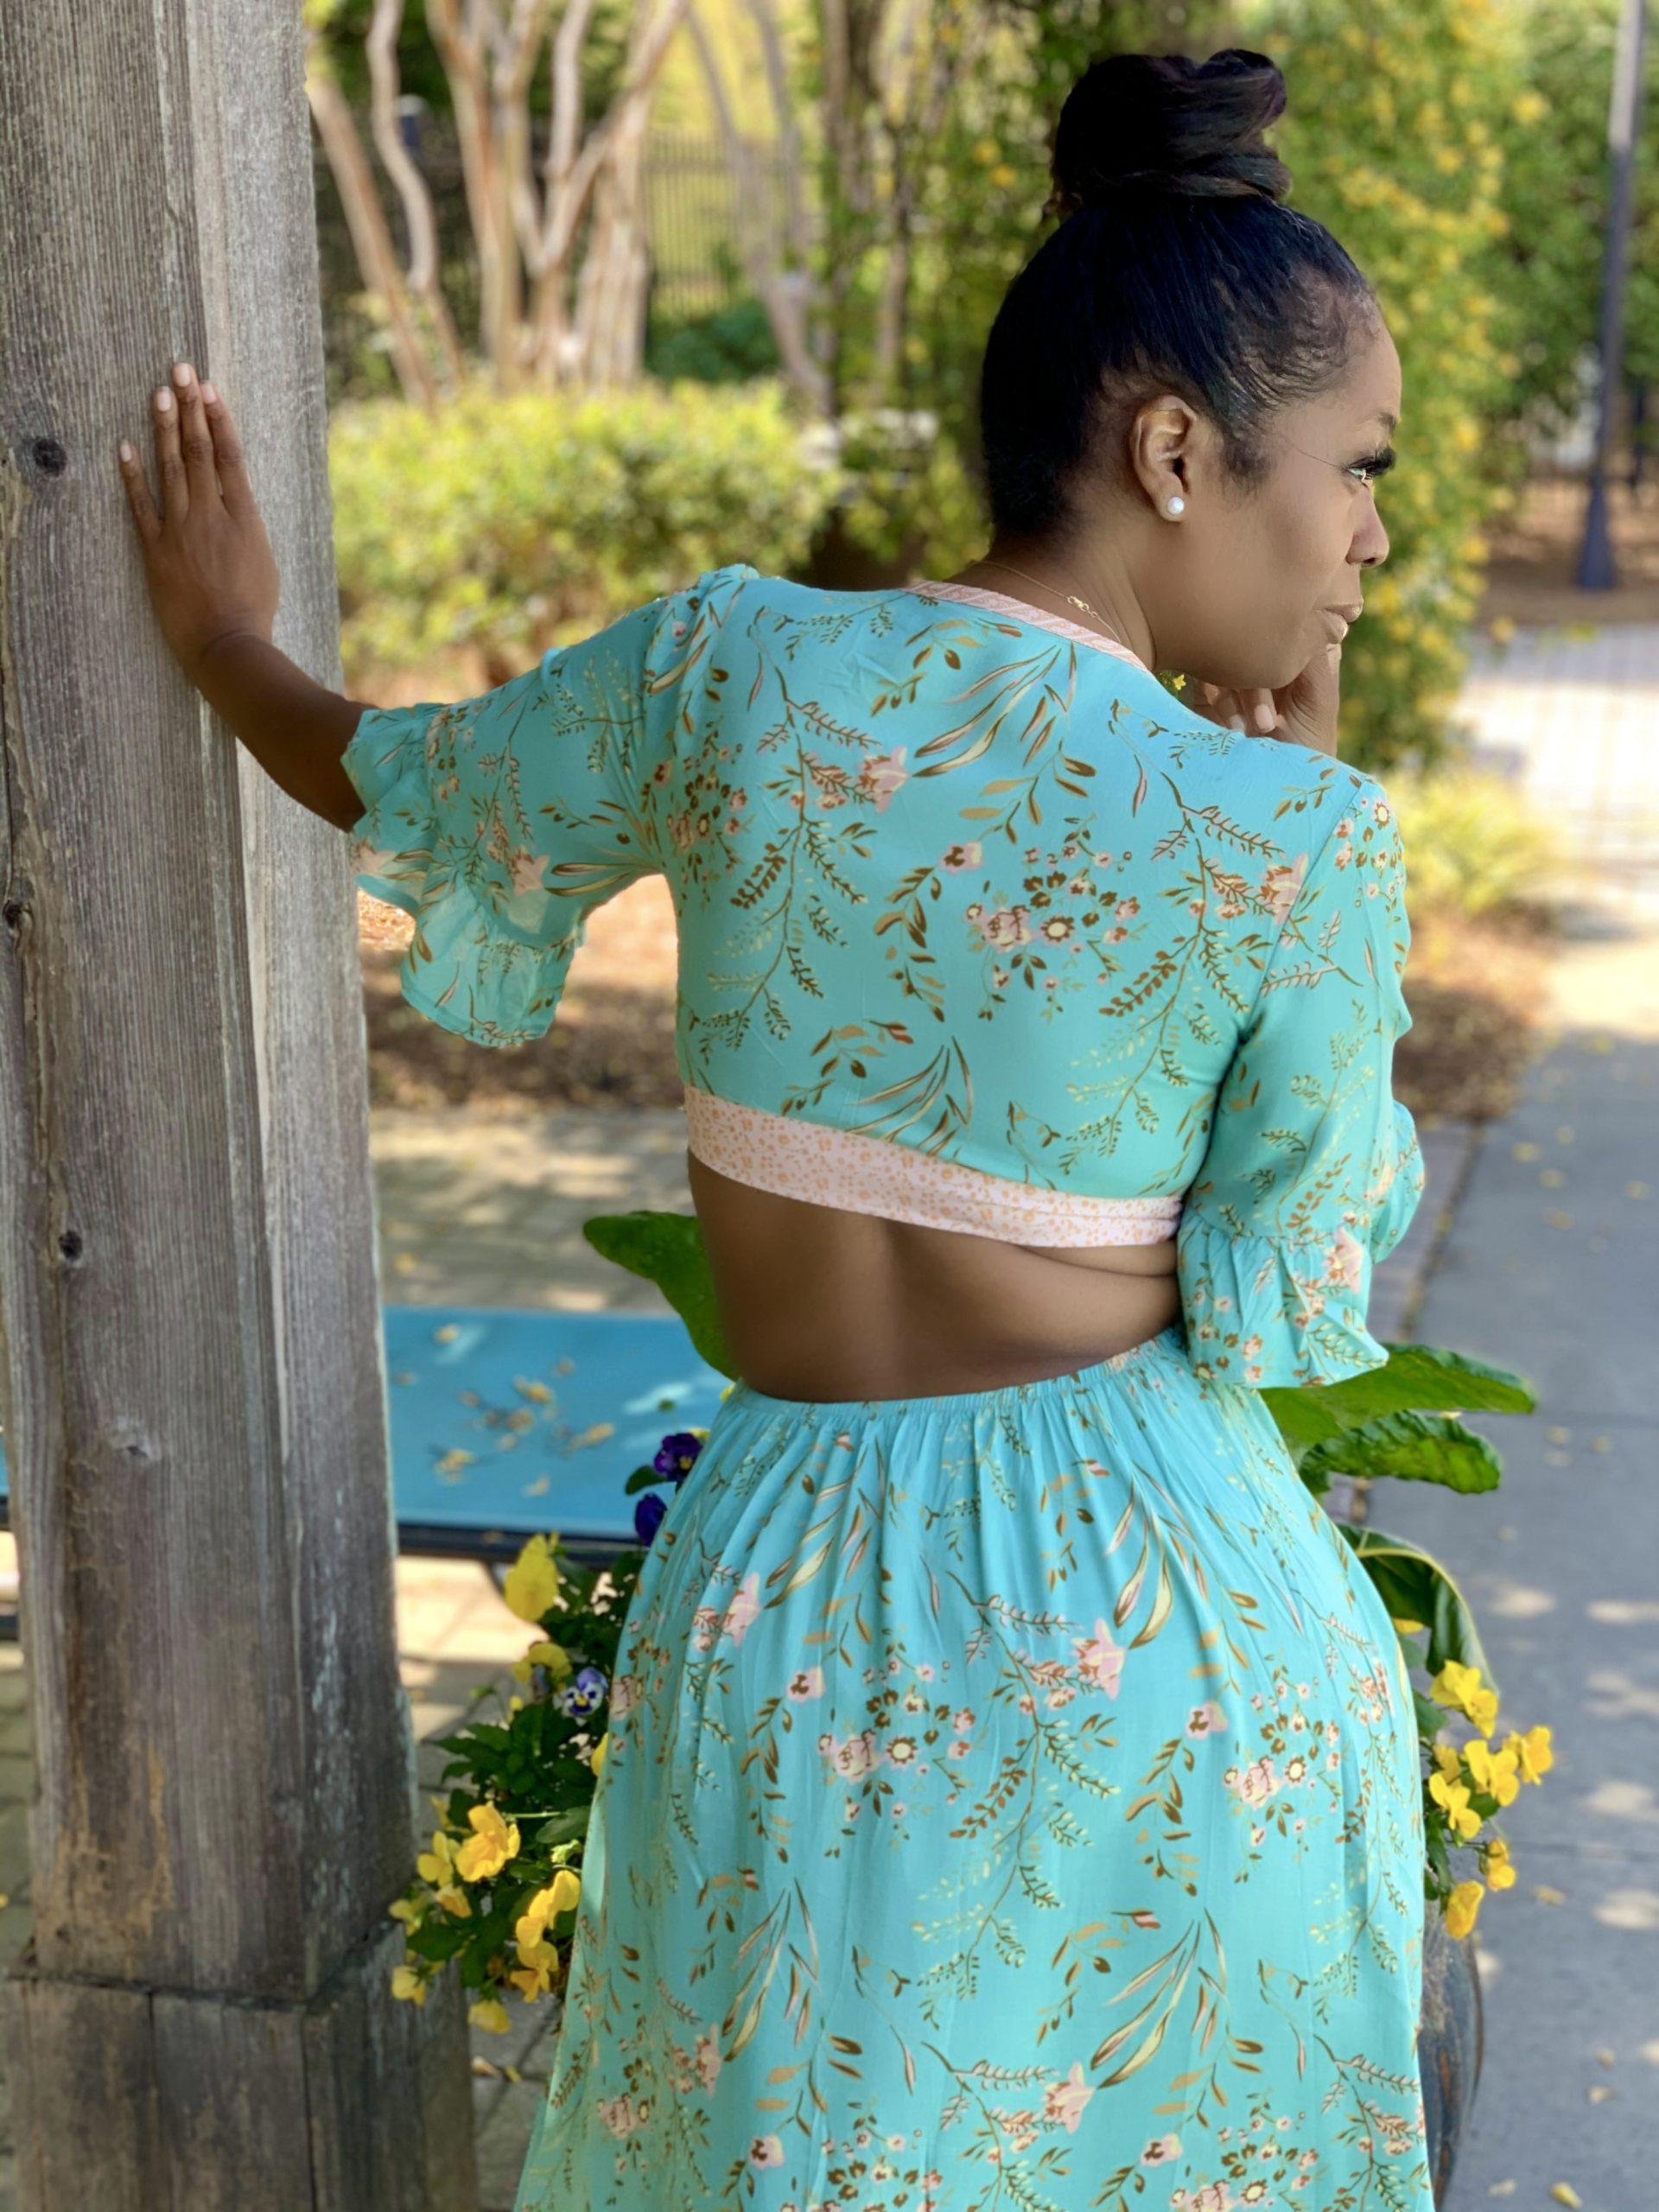 My Style: High-Low Hemline Boho Dress